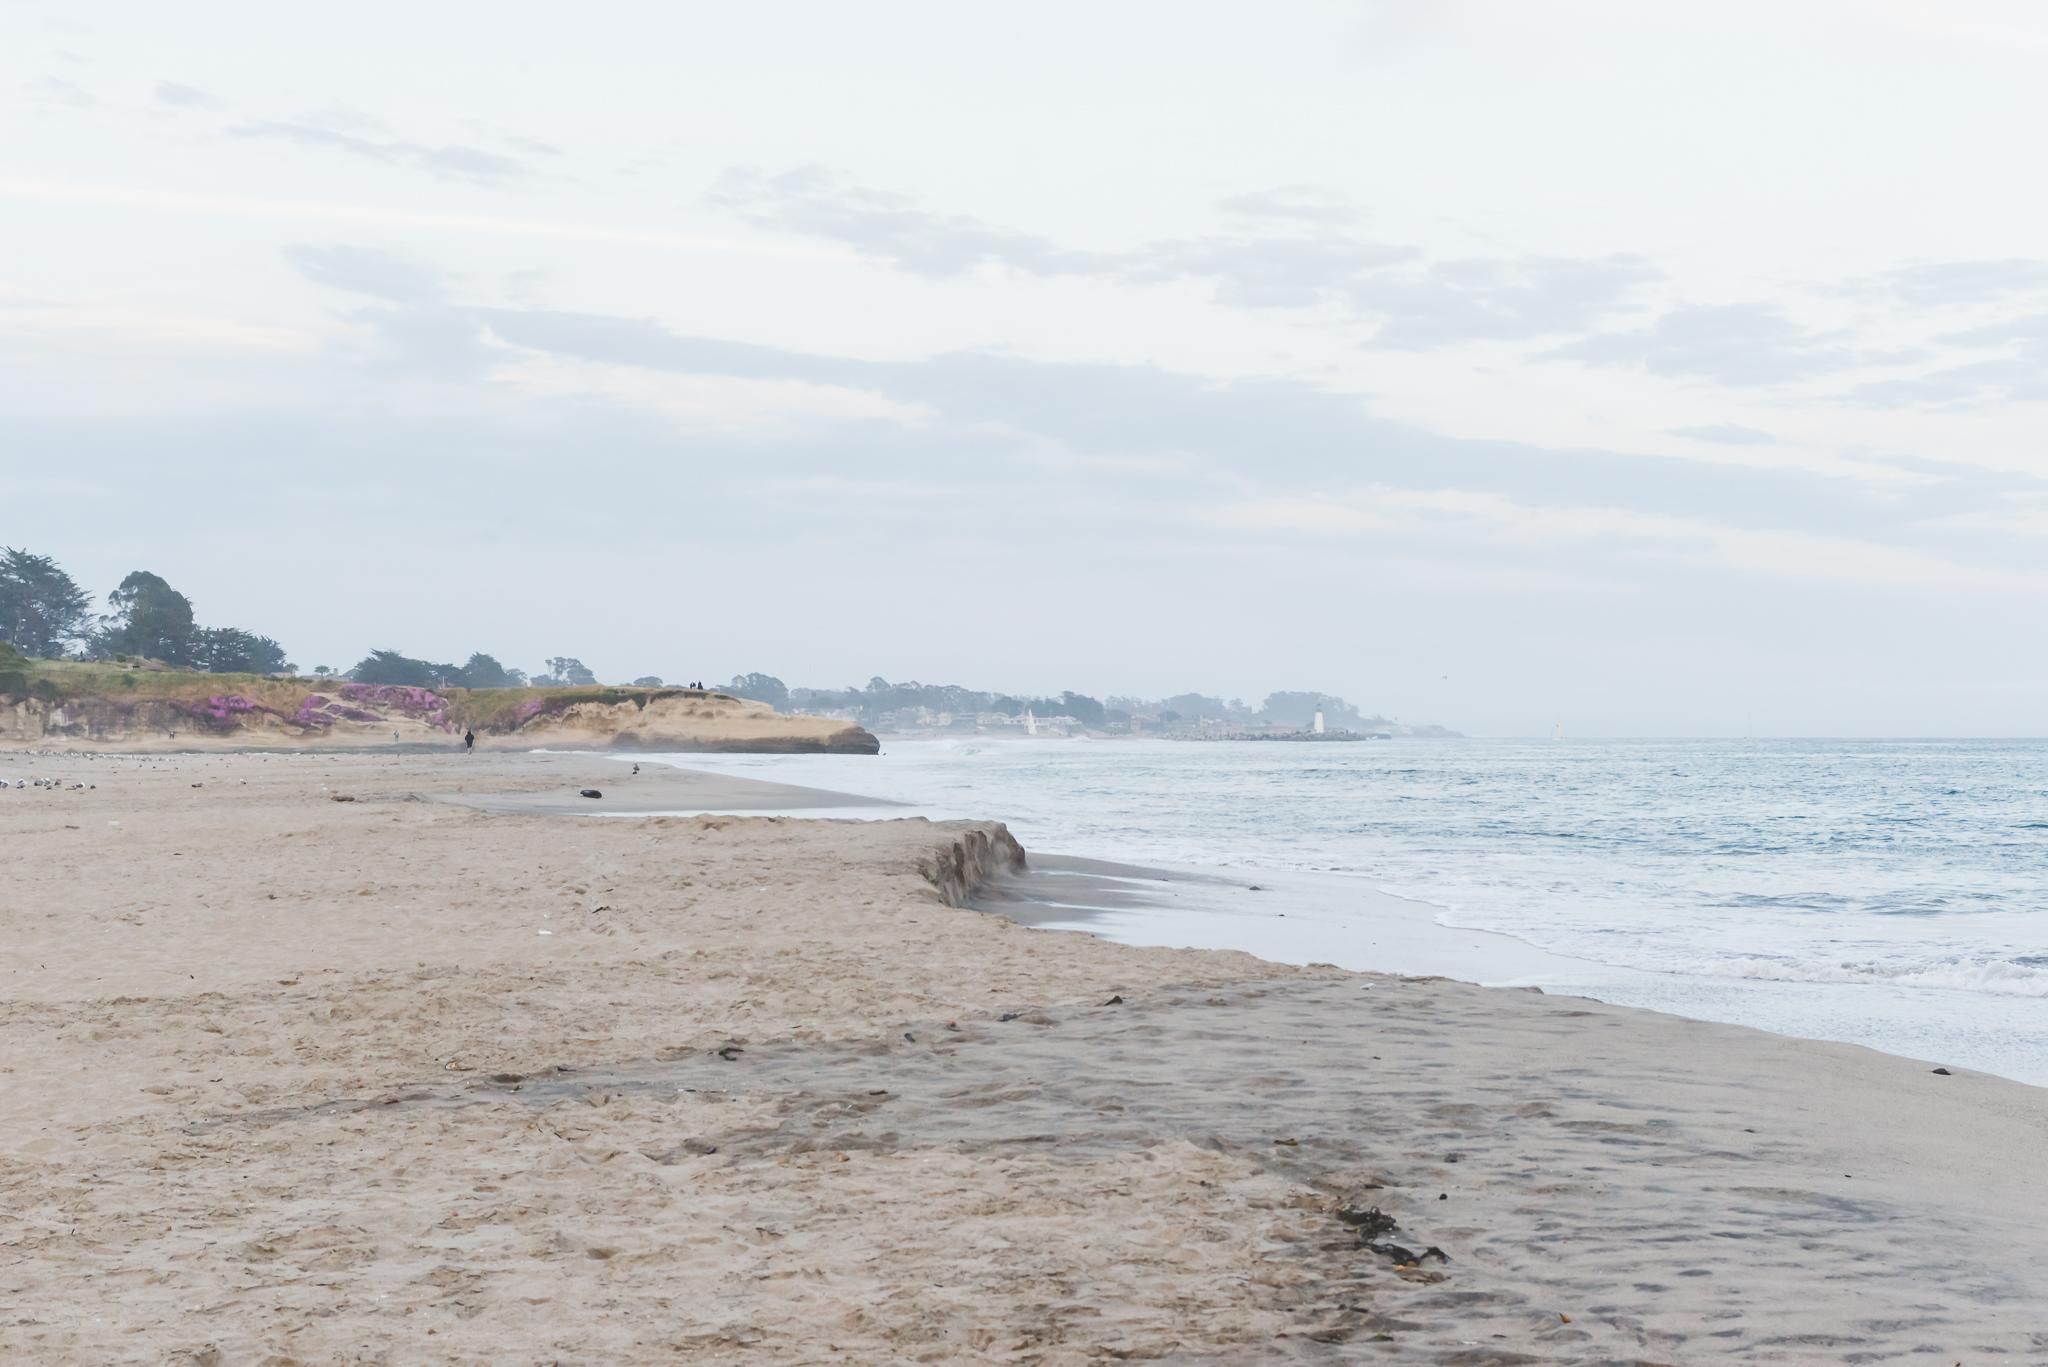 Another view of the beach. / 5/3/16 / Santa Cruz, CA